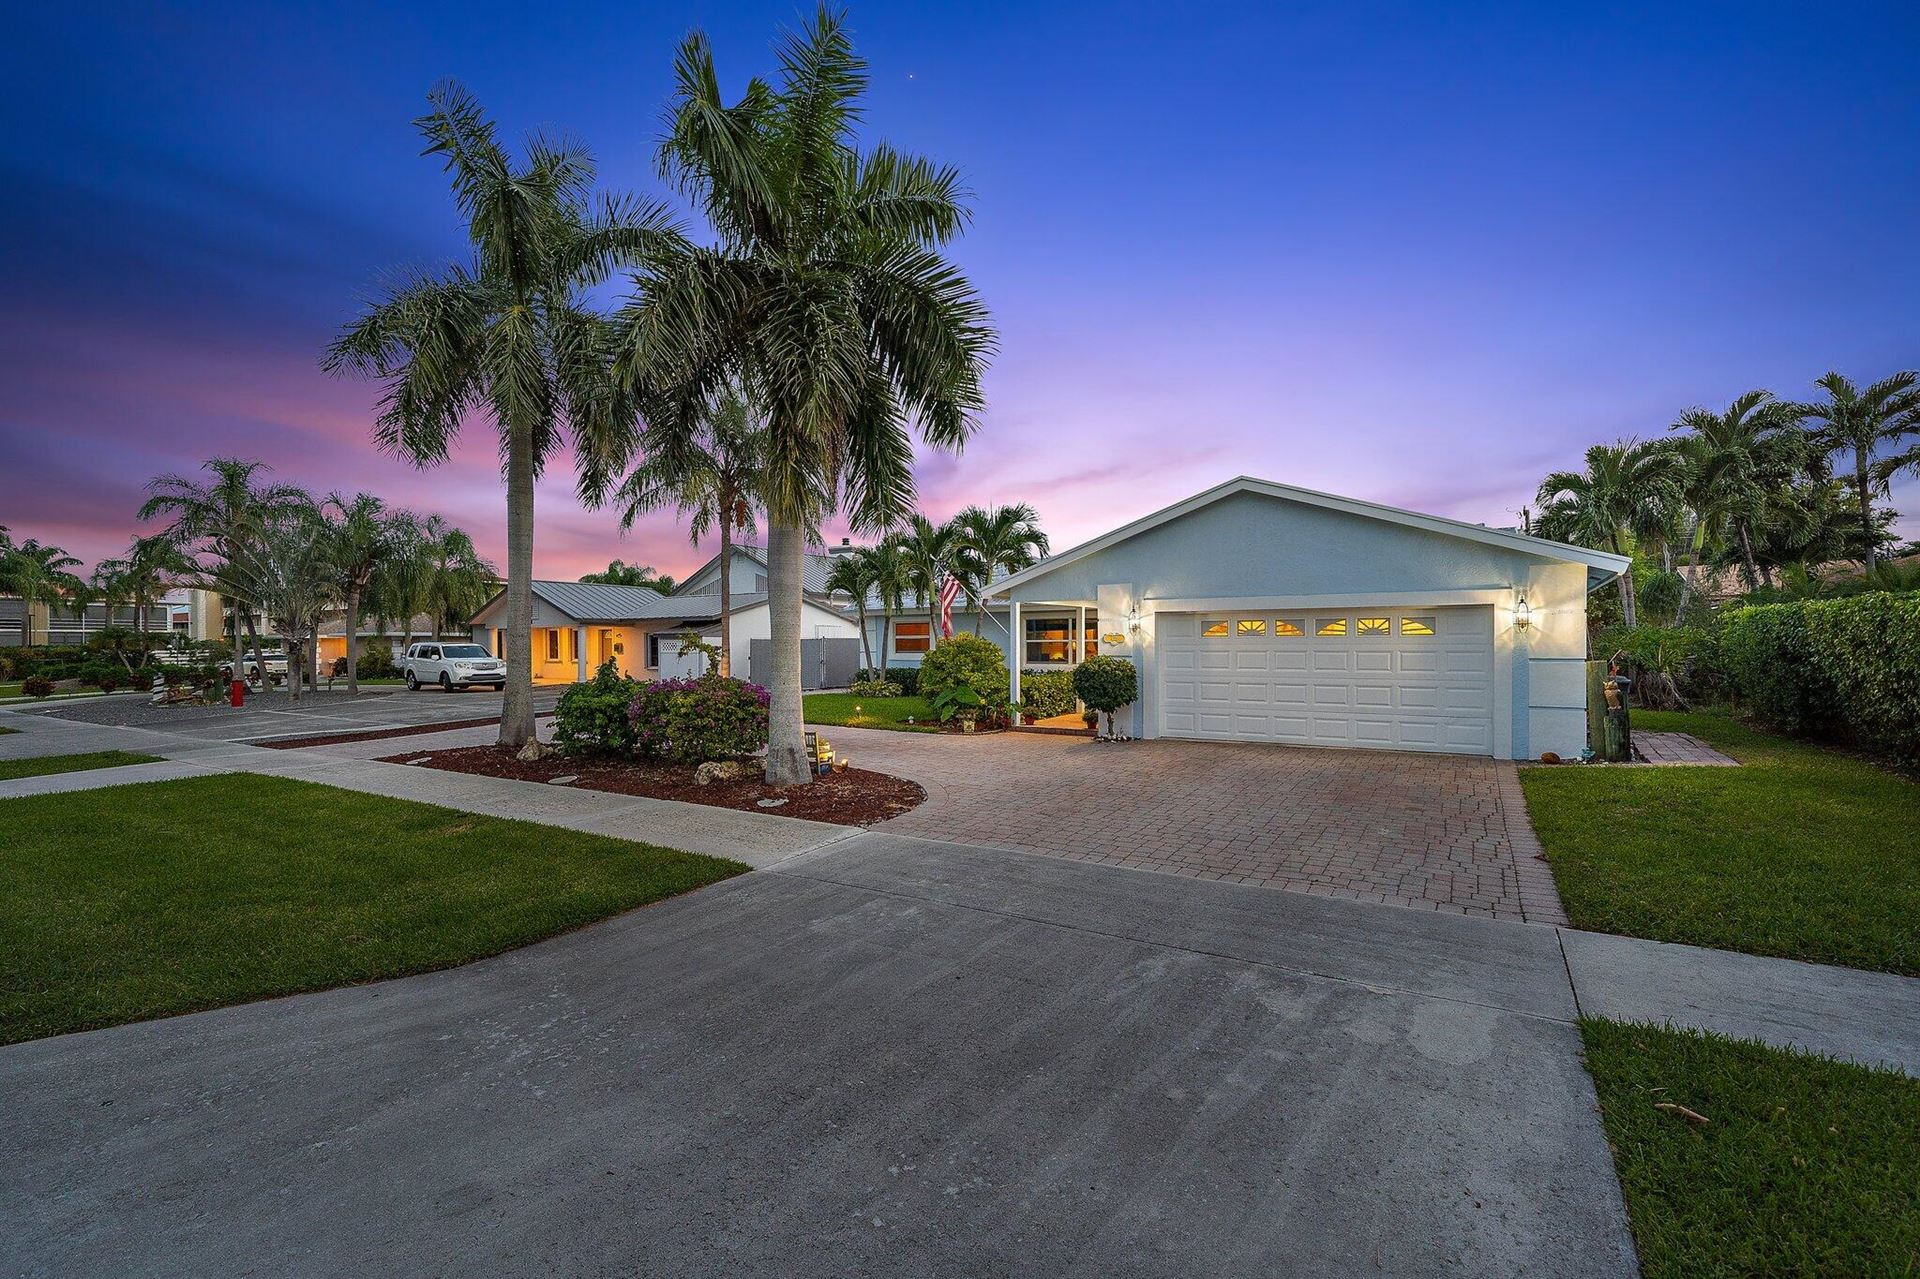 Photo of 412 Anchorage Lane, North Palm Beach, FL 33408 (MLS # RX-10751550)